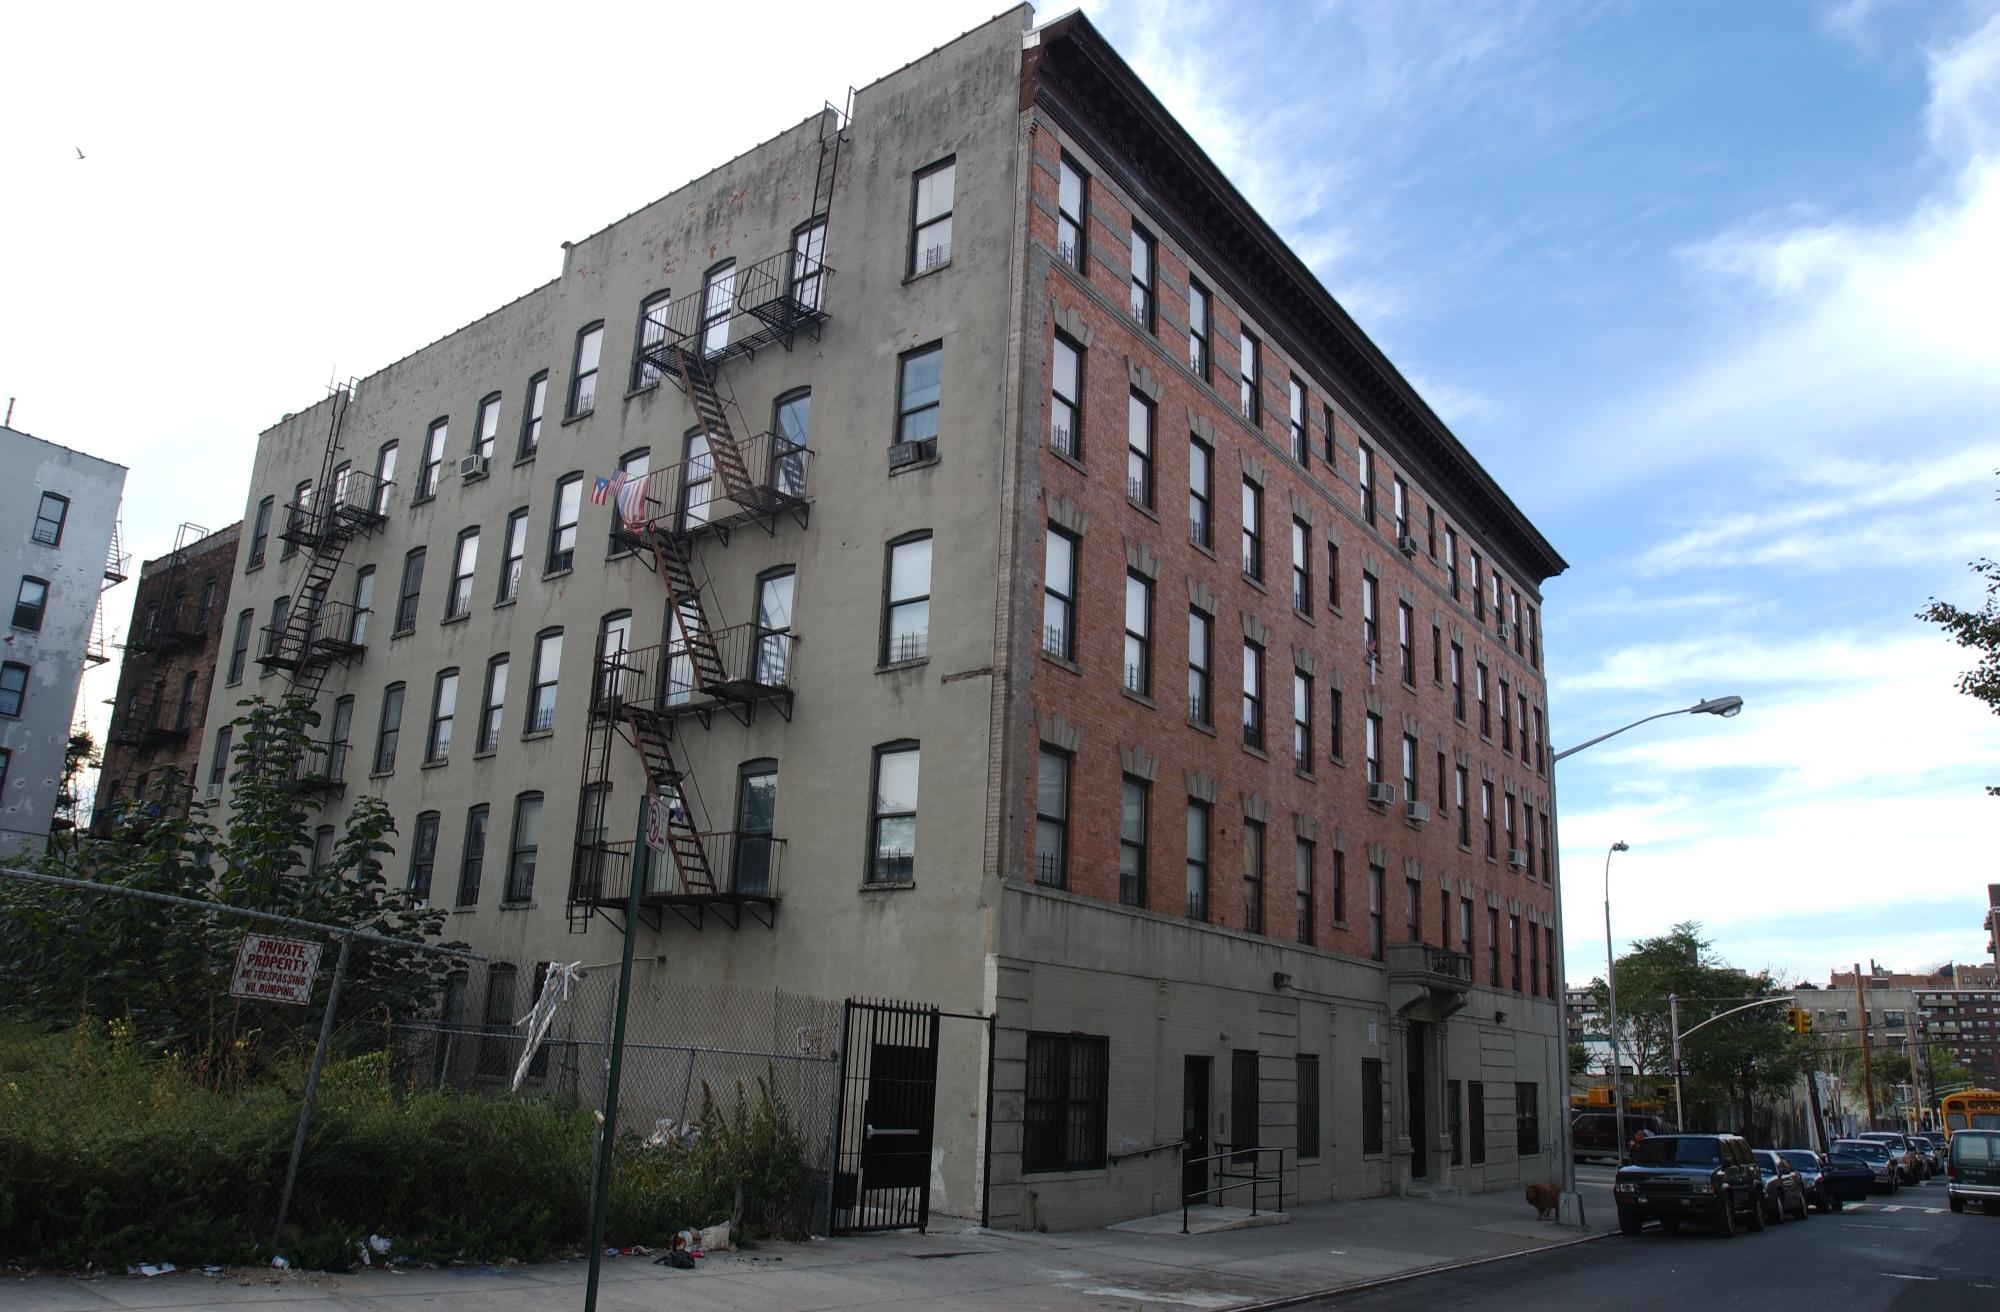 440 East 182nd Street